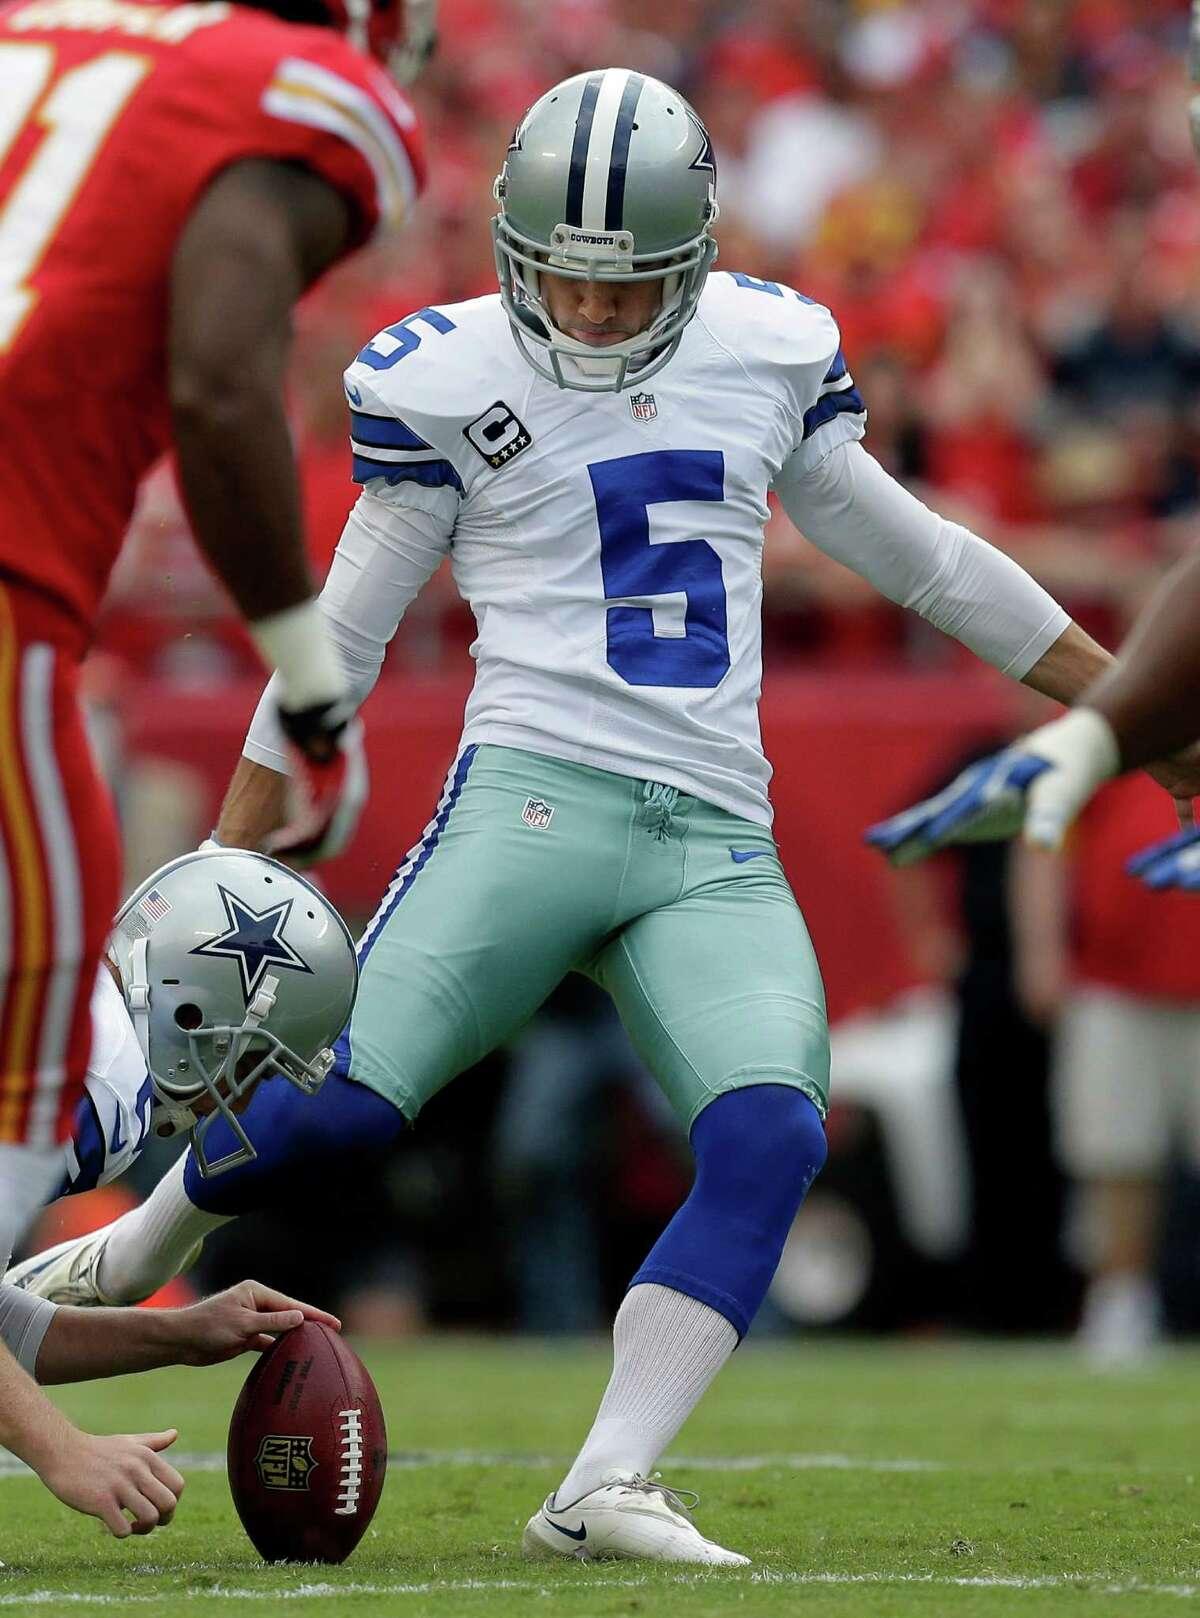 Dallas Cowboys kicker Dan Bailey (5) kicks a field goal during the first half of an NFL football game against the Kansas City Chiefs at Arrowhead Stadium in Kansas City, Mo., Sunday, Sept. 15, 2013. (AP Photo/Charlie Riedel)